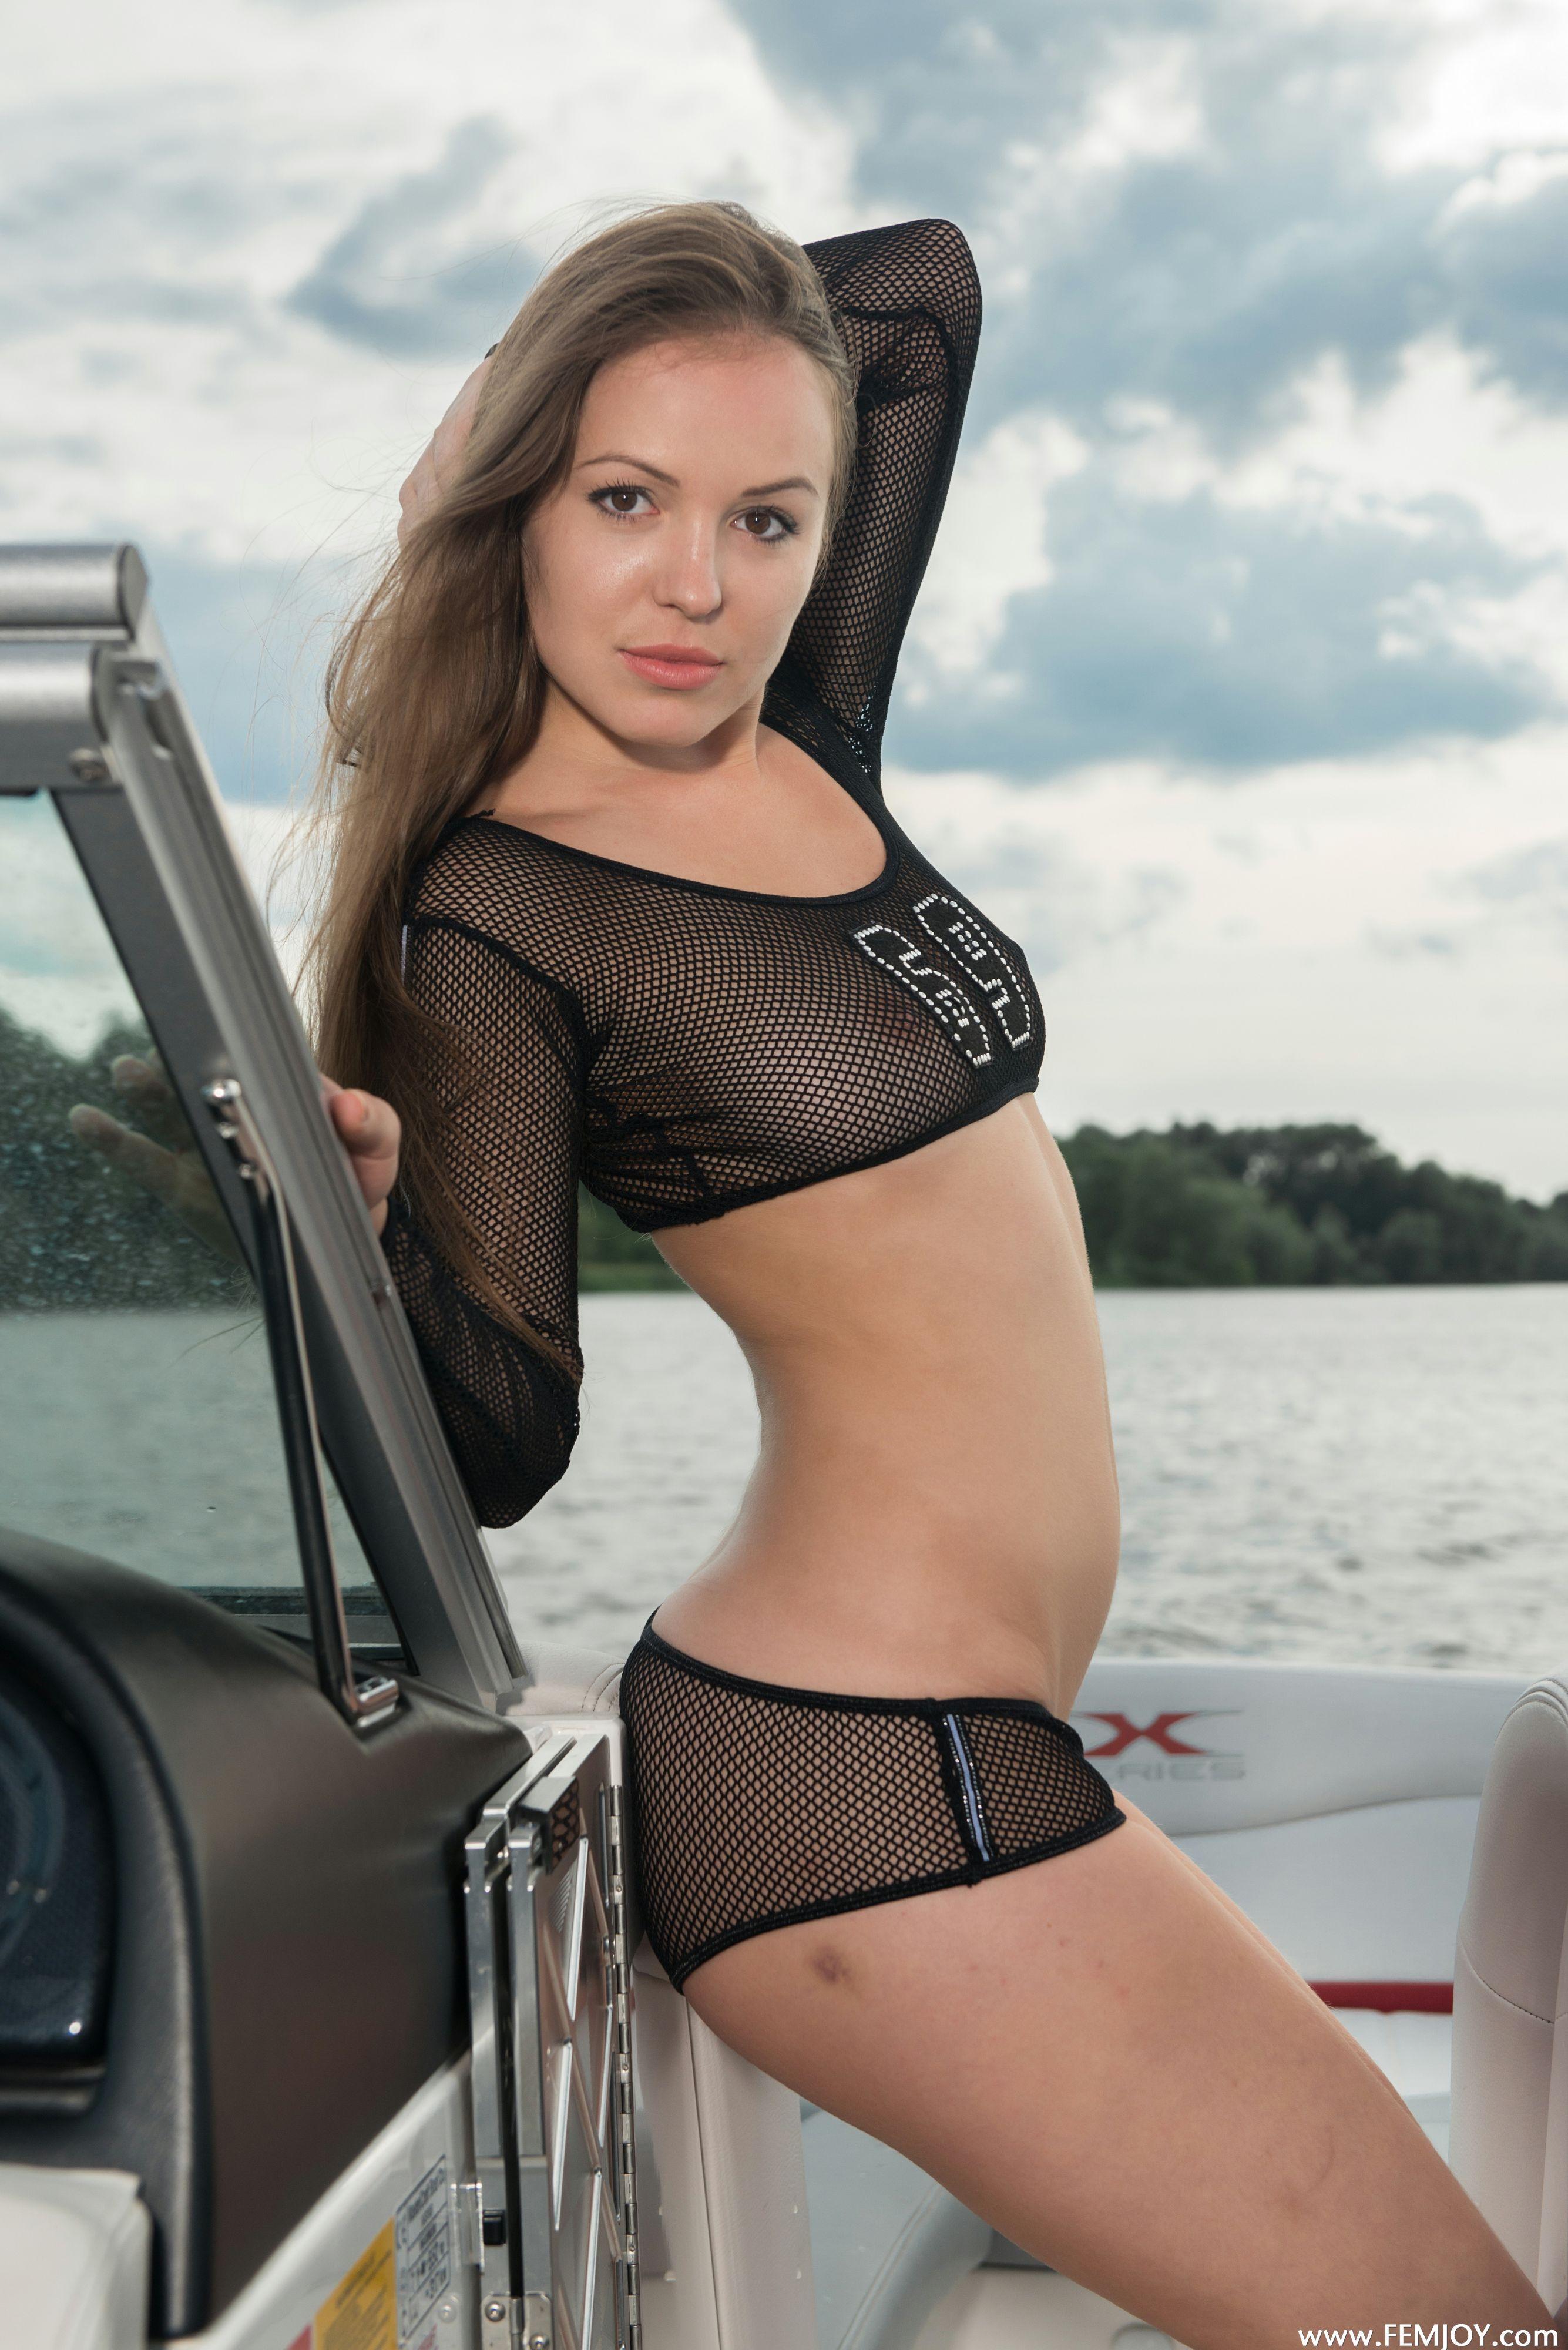 http://i6.imageban.ru/out/2013/11/13/4d44d755e9b891f86f0b7f3b942ca38e.jpg